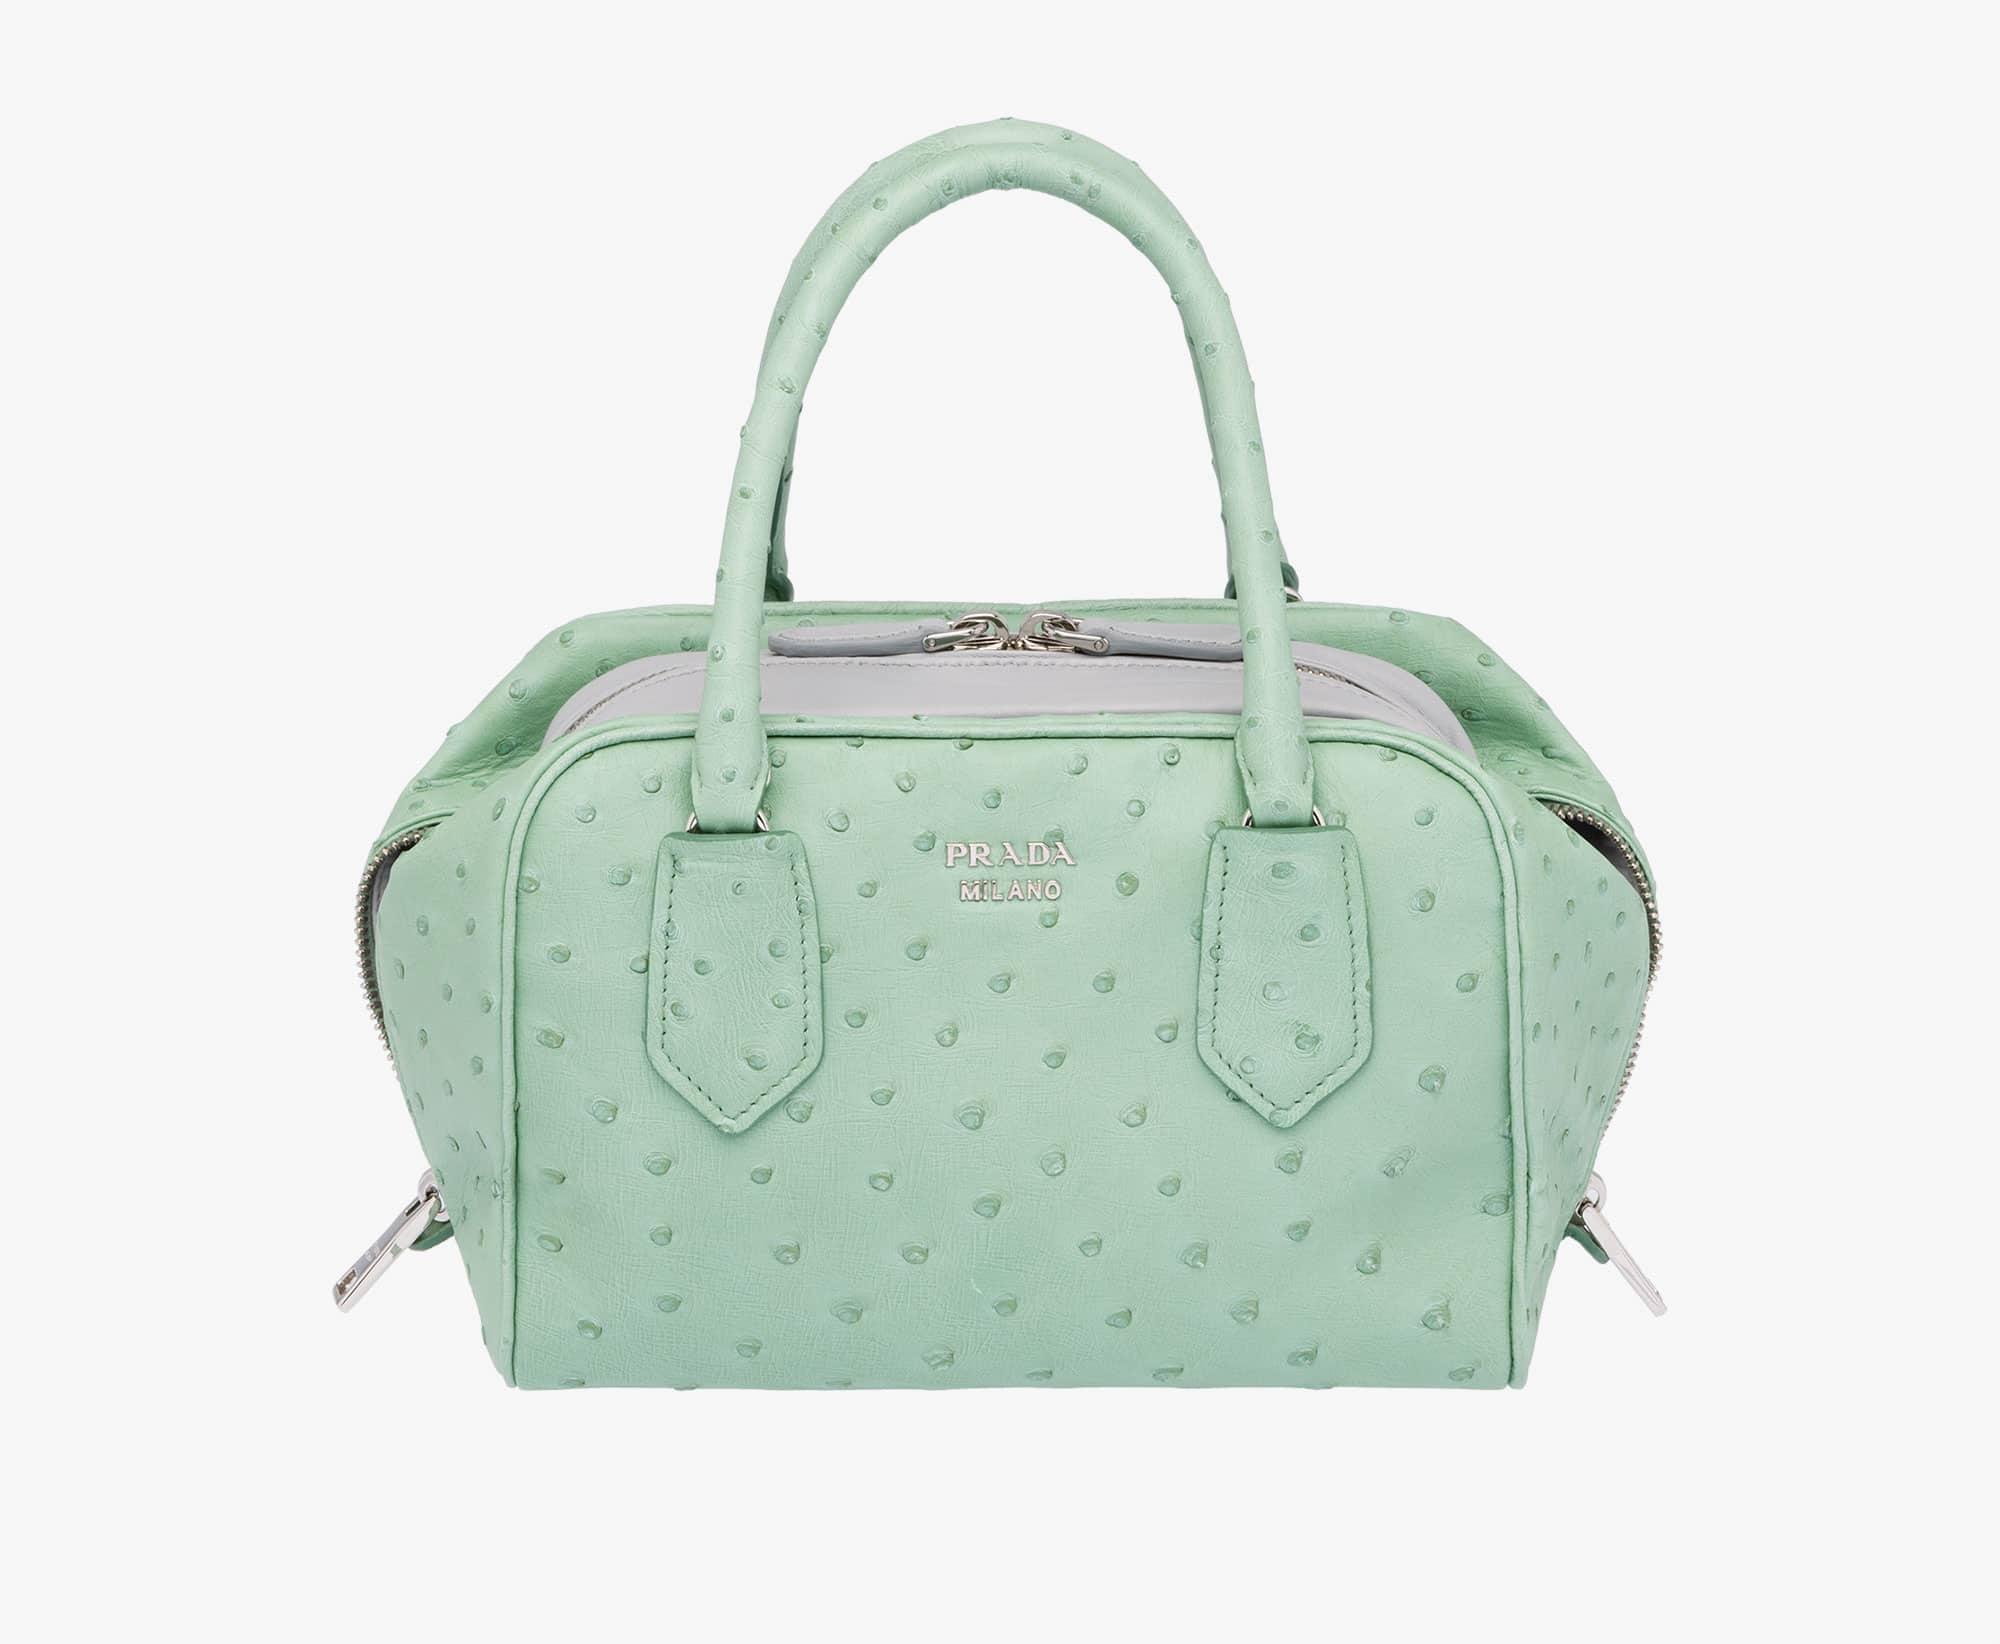 prada handbag fake - Prada Inside Tote Bag Reference Guide   Spotted Fashion